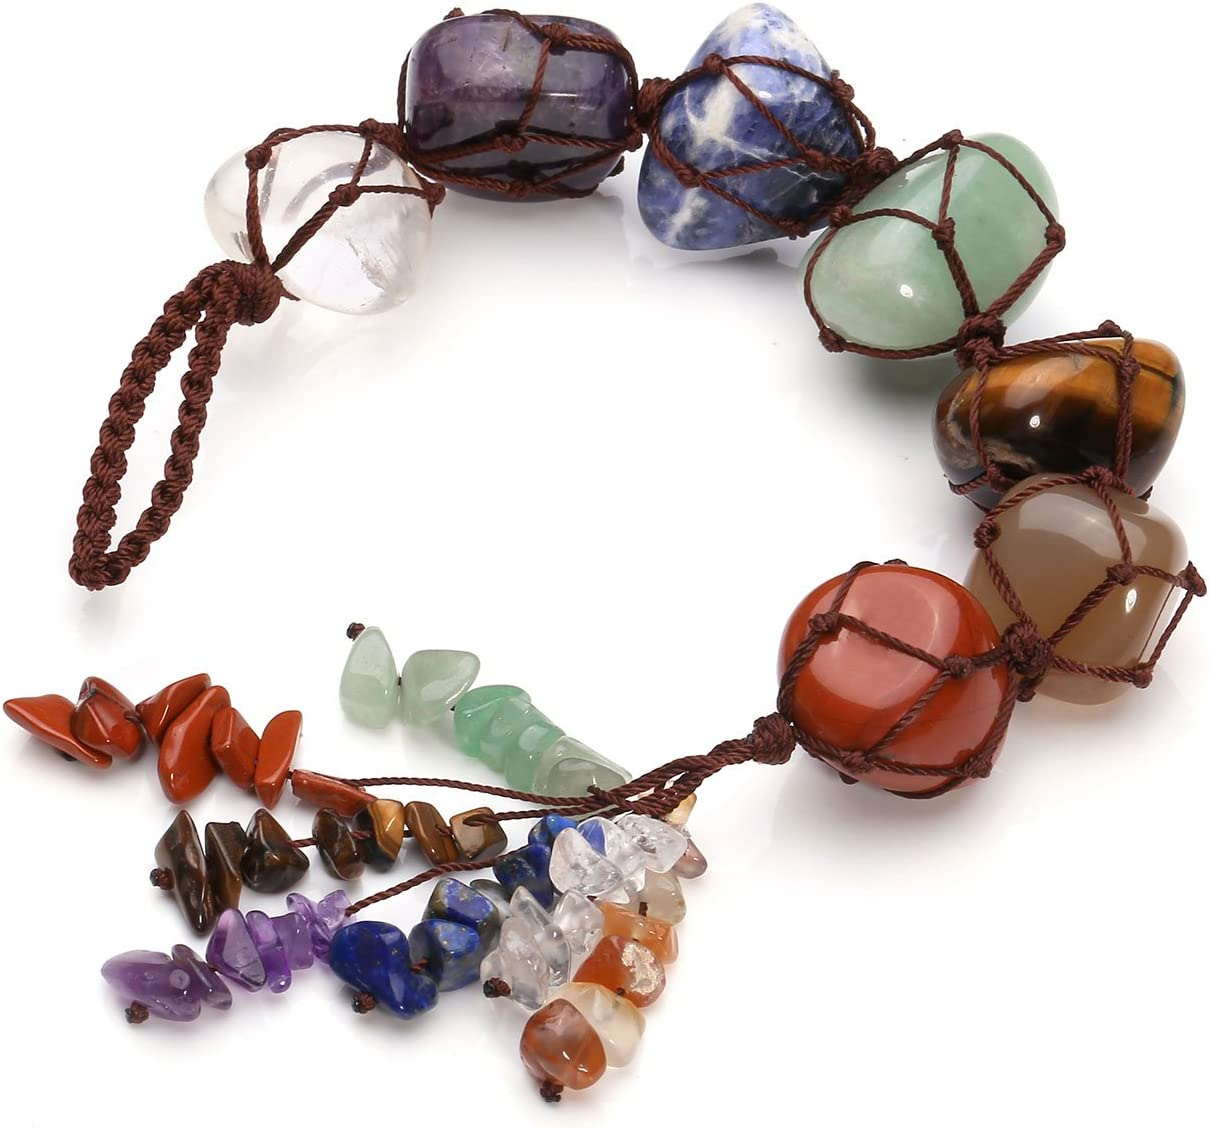 CrystalTears 7 Chakra Crystals Hanging Ornament,Reiki Tumbled Gemstone Window Ornament,Feng Shui Ornament,Yoga Meditation, Decor